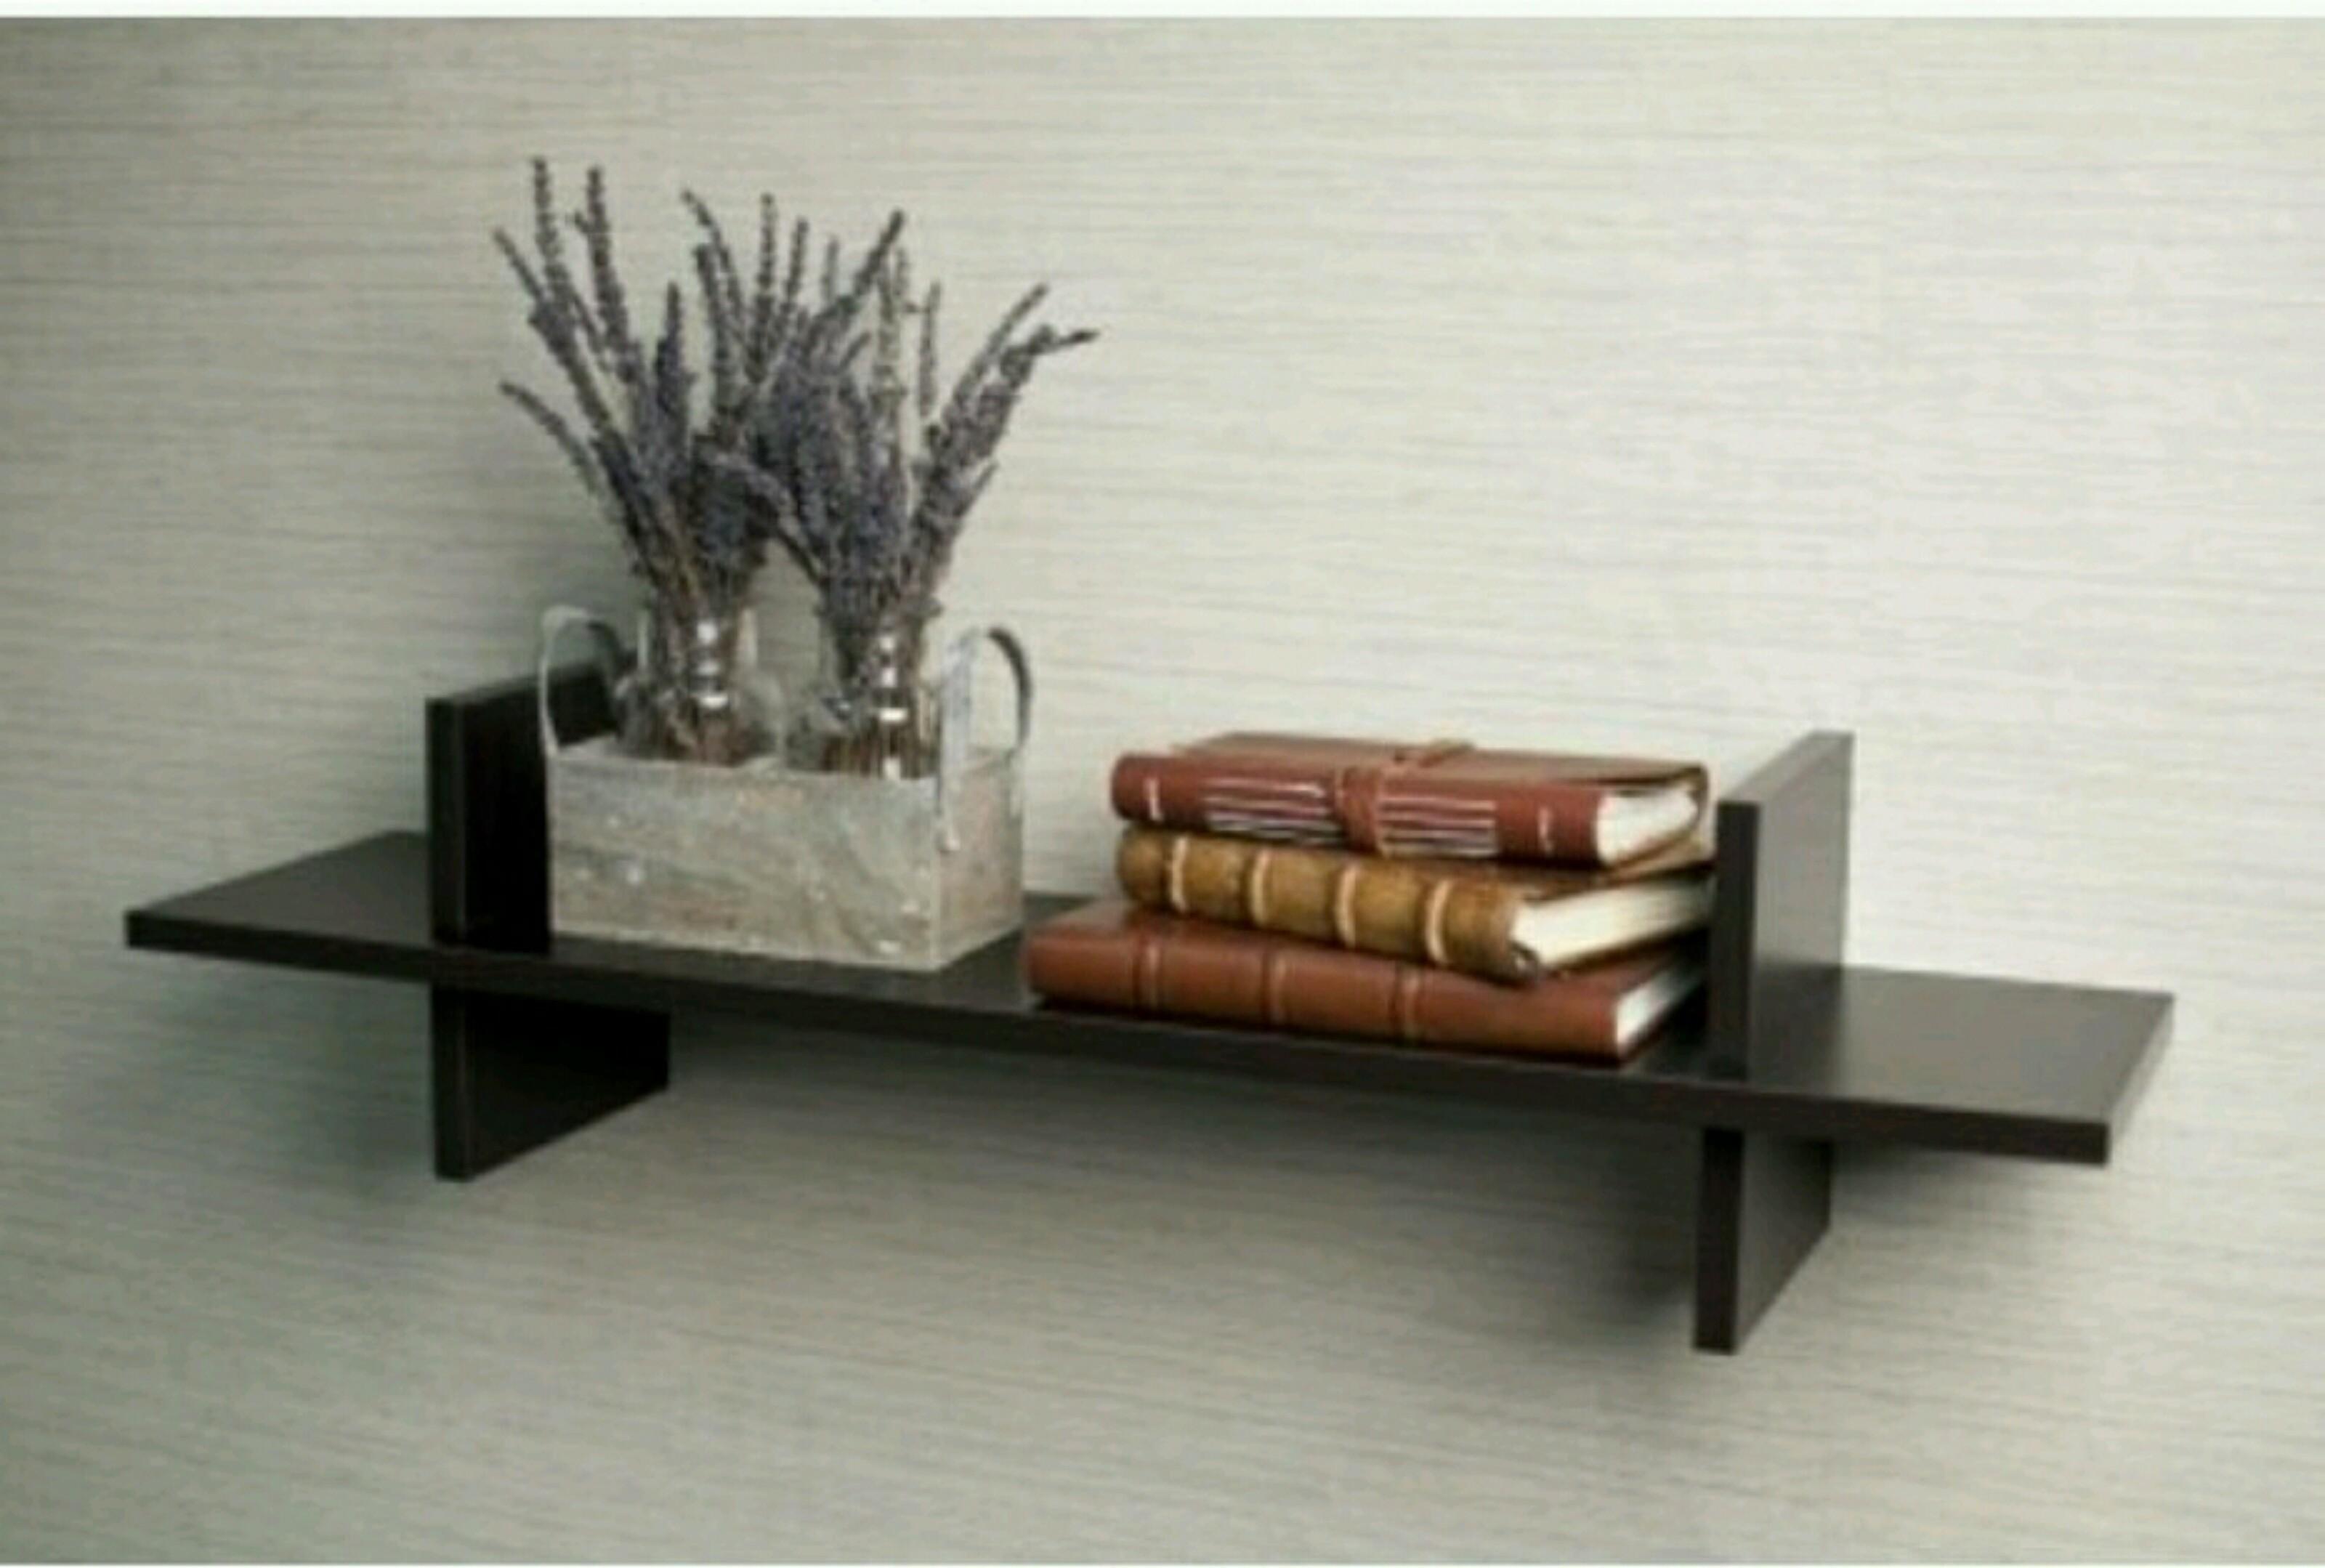 View Martcrown Book Rack MDF Wall Shelf(Number of Shelves - 1, Black) Furniture (Martcrown)